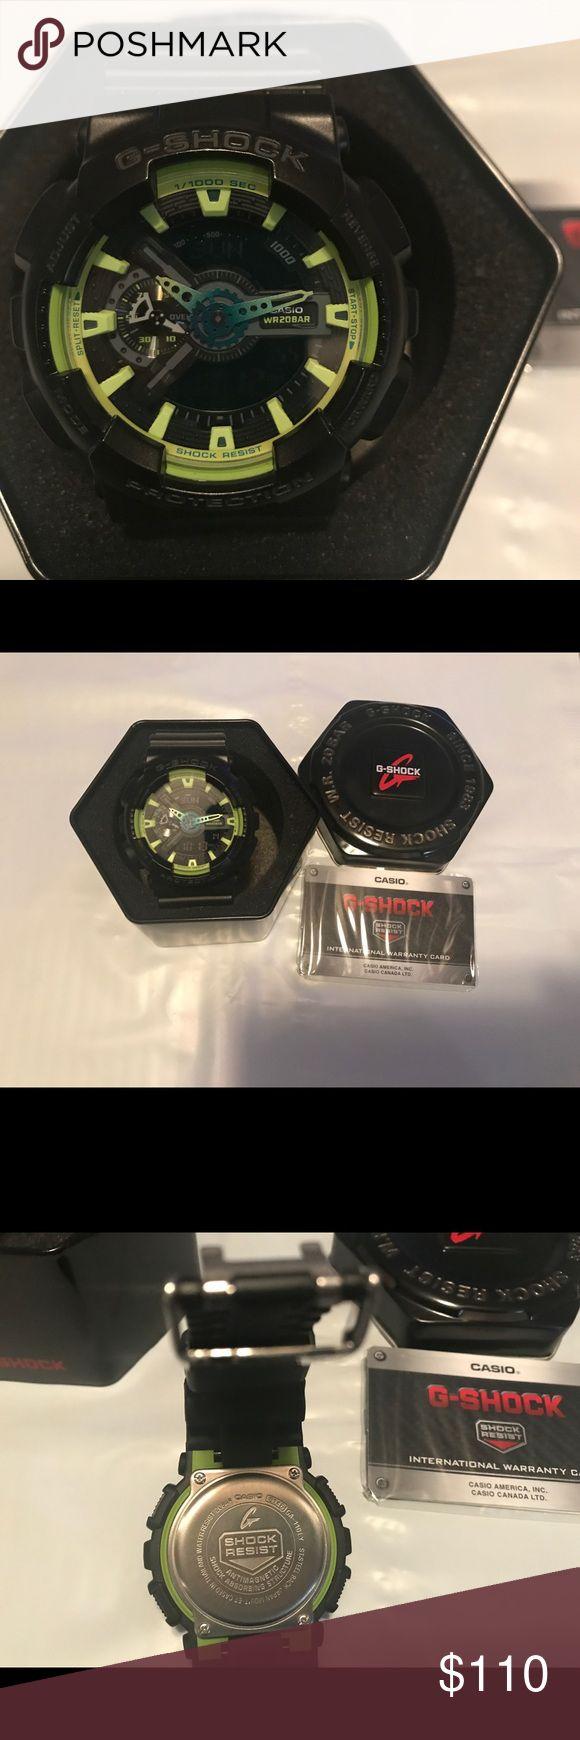 Casio G-Shock watch Brand New G-Shock watch  100% authentic  Black band , green trim and blue hands G-Shock Accessories Watches